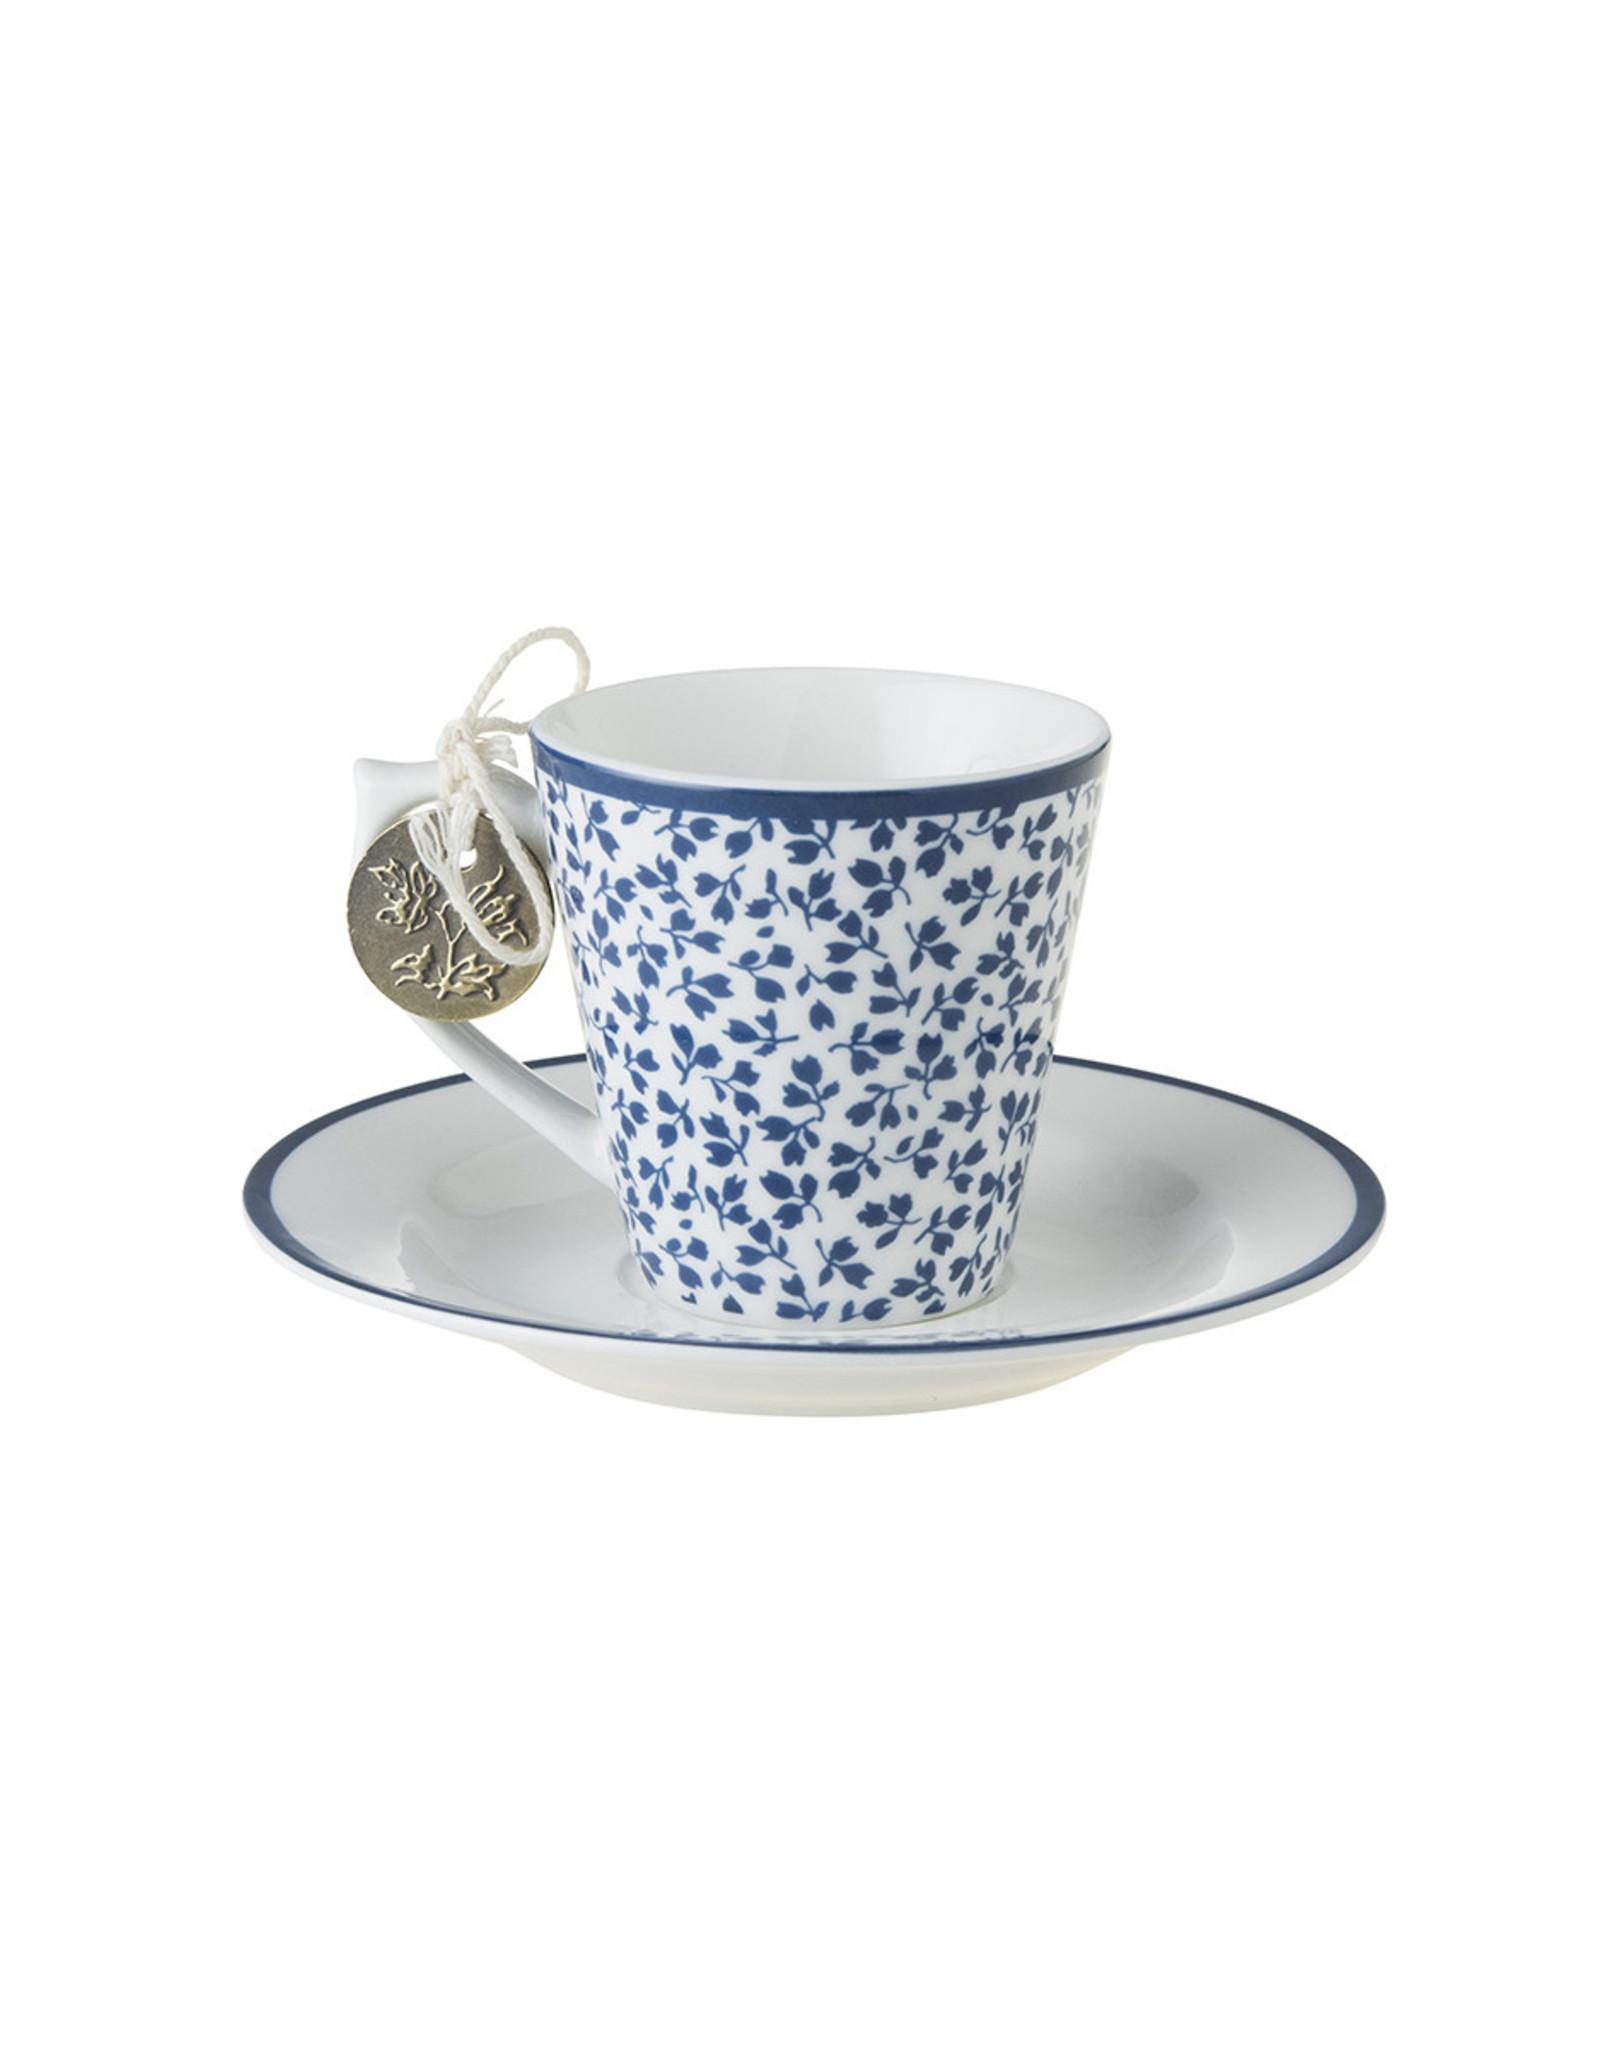 Laura Ashley Kop & schotel espresso Floris - Laura Ashley